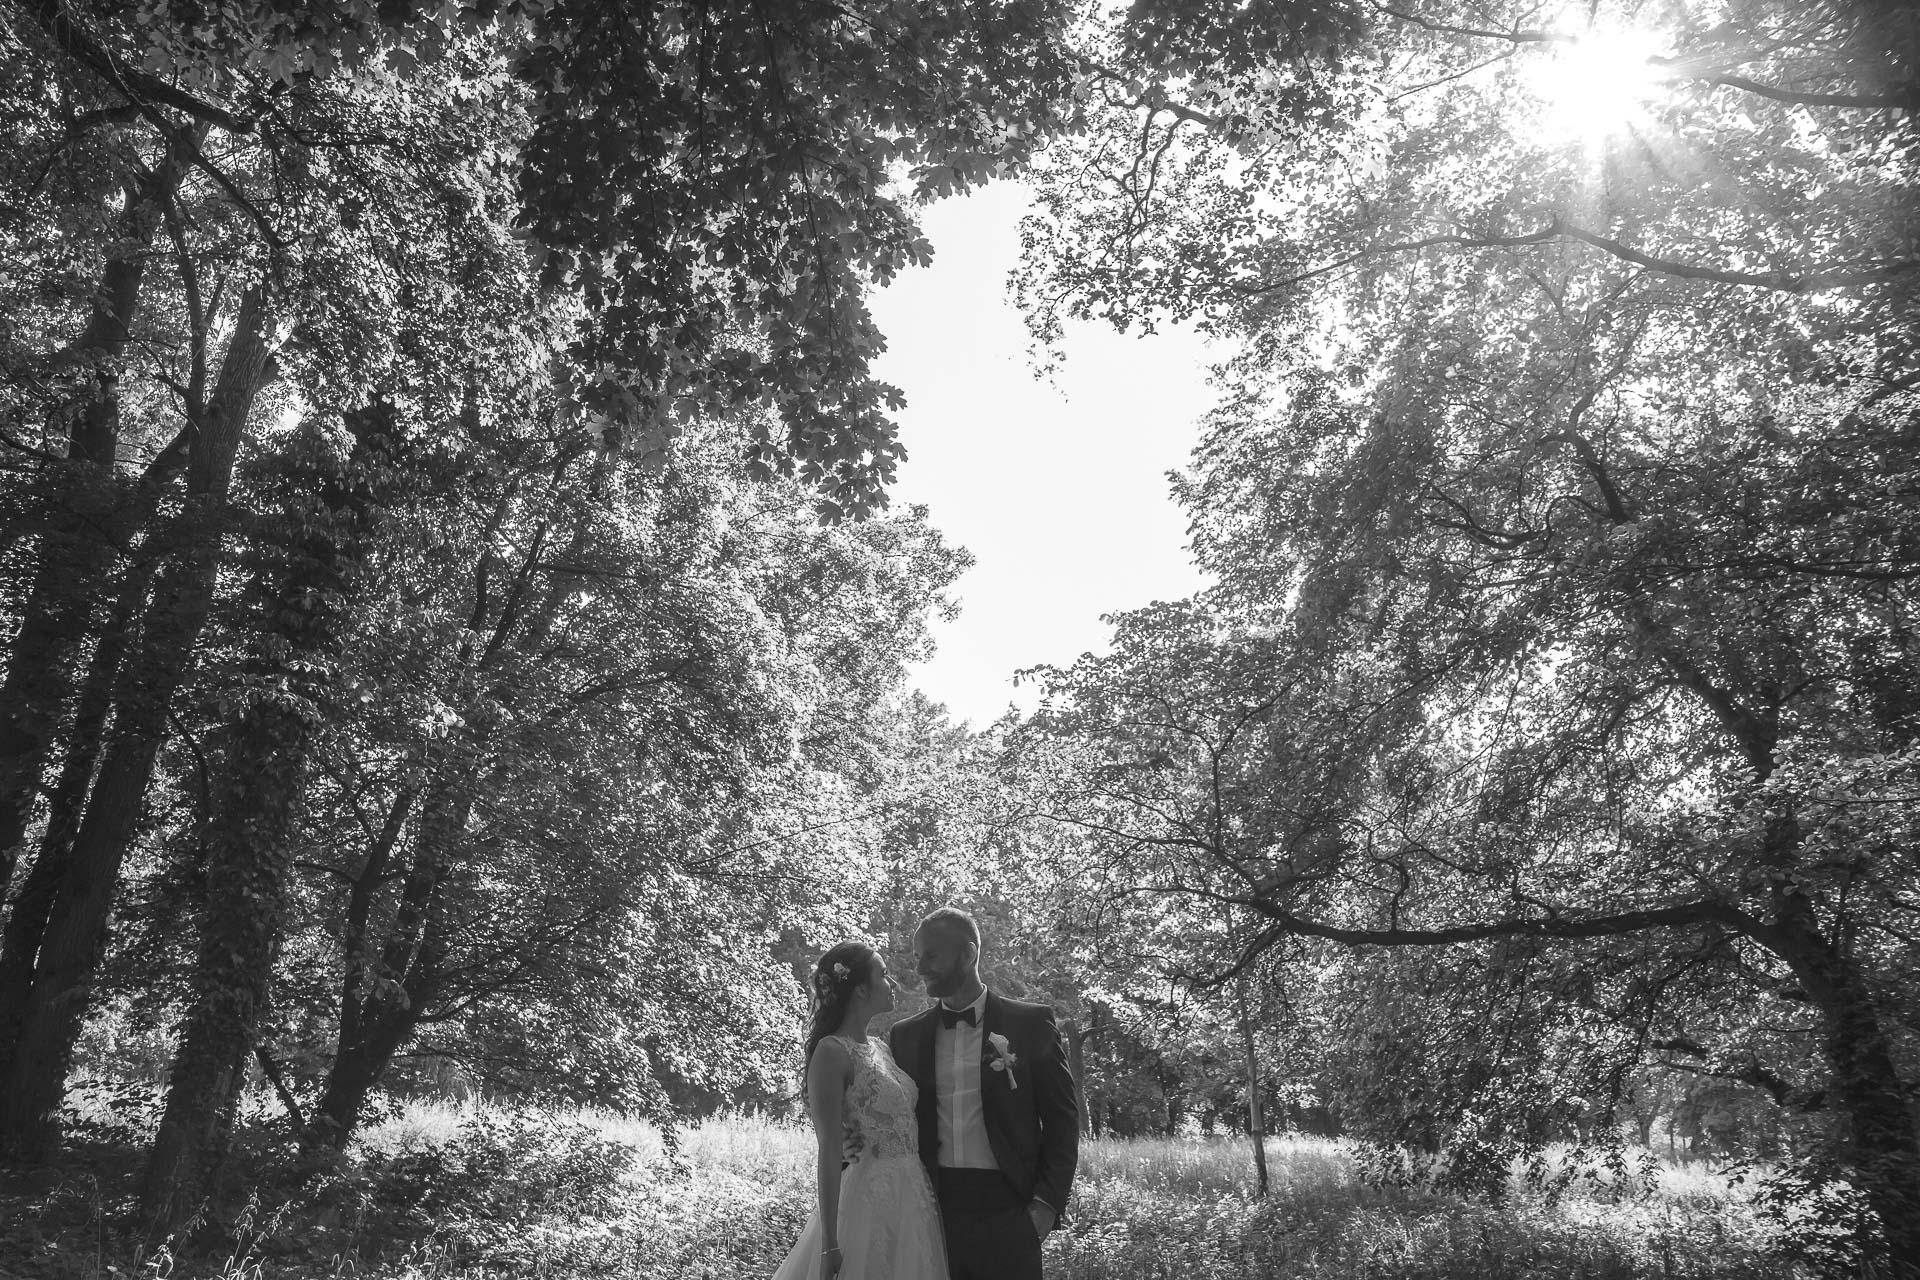 svatební-fotograf-svatebni-video-Nymburk-hotel-Ostrov-Beautyfoto-6256